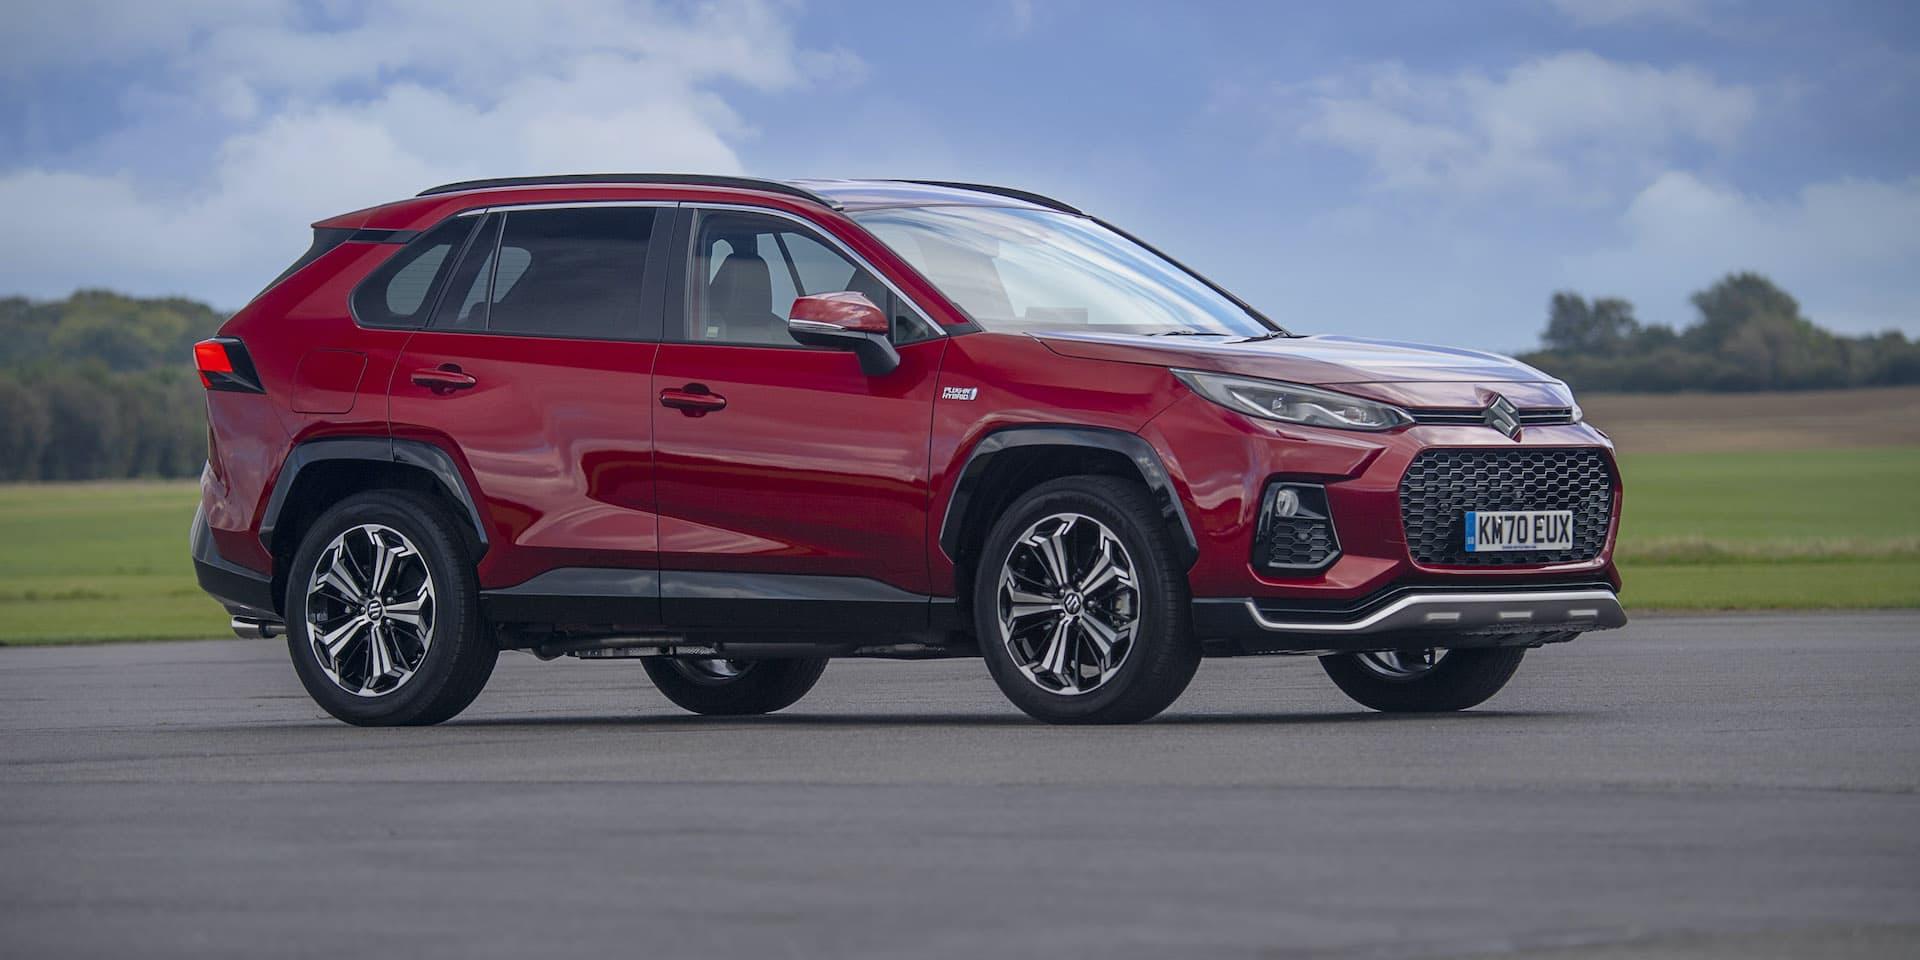 Suzuki Across plug-in hybrid SUV goes on sale in UK